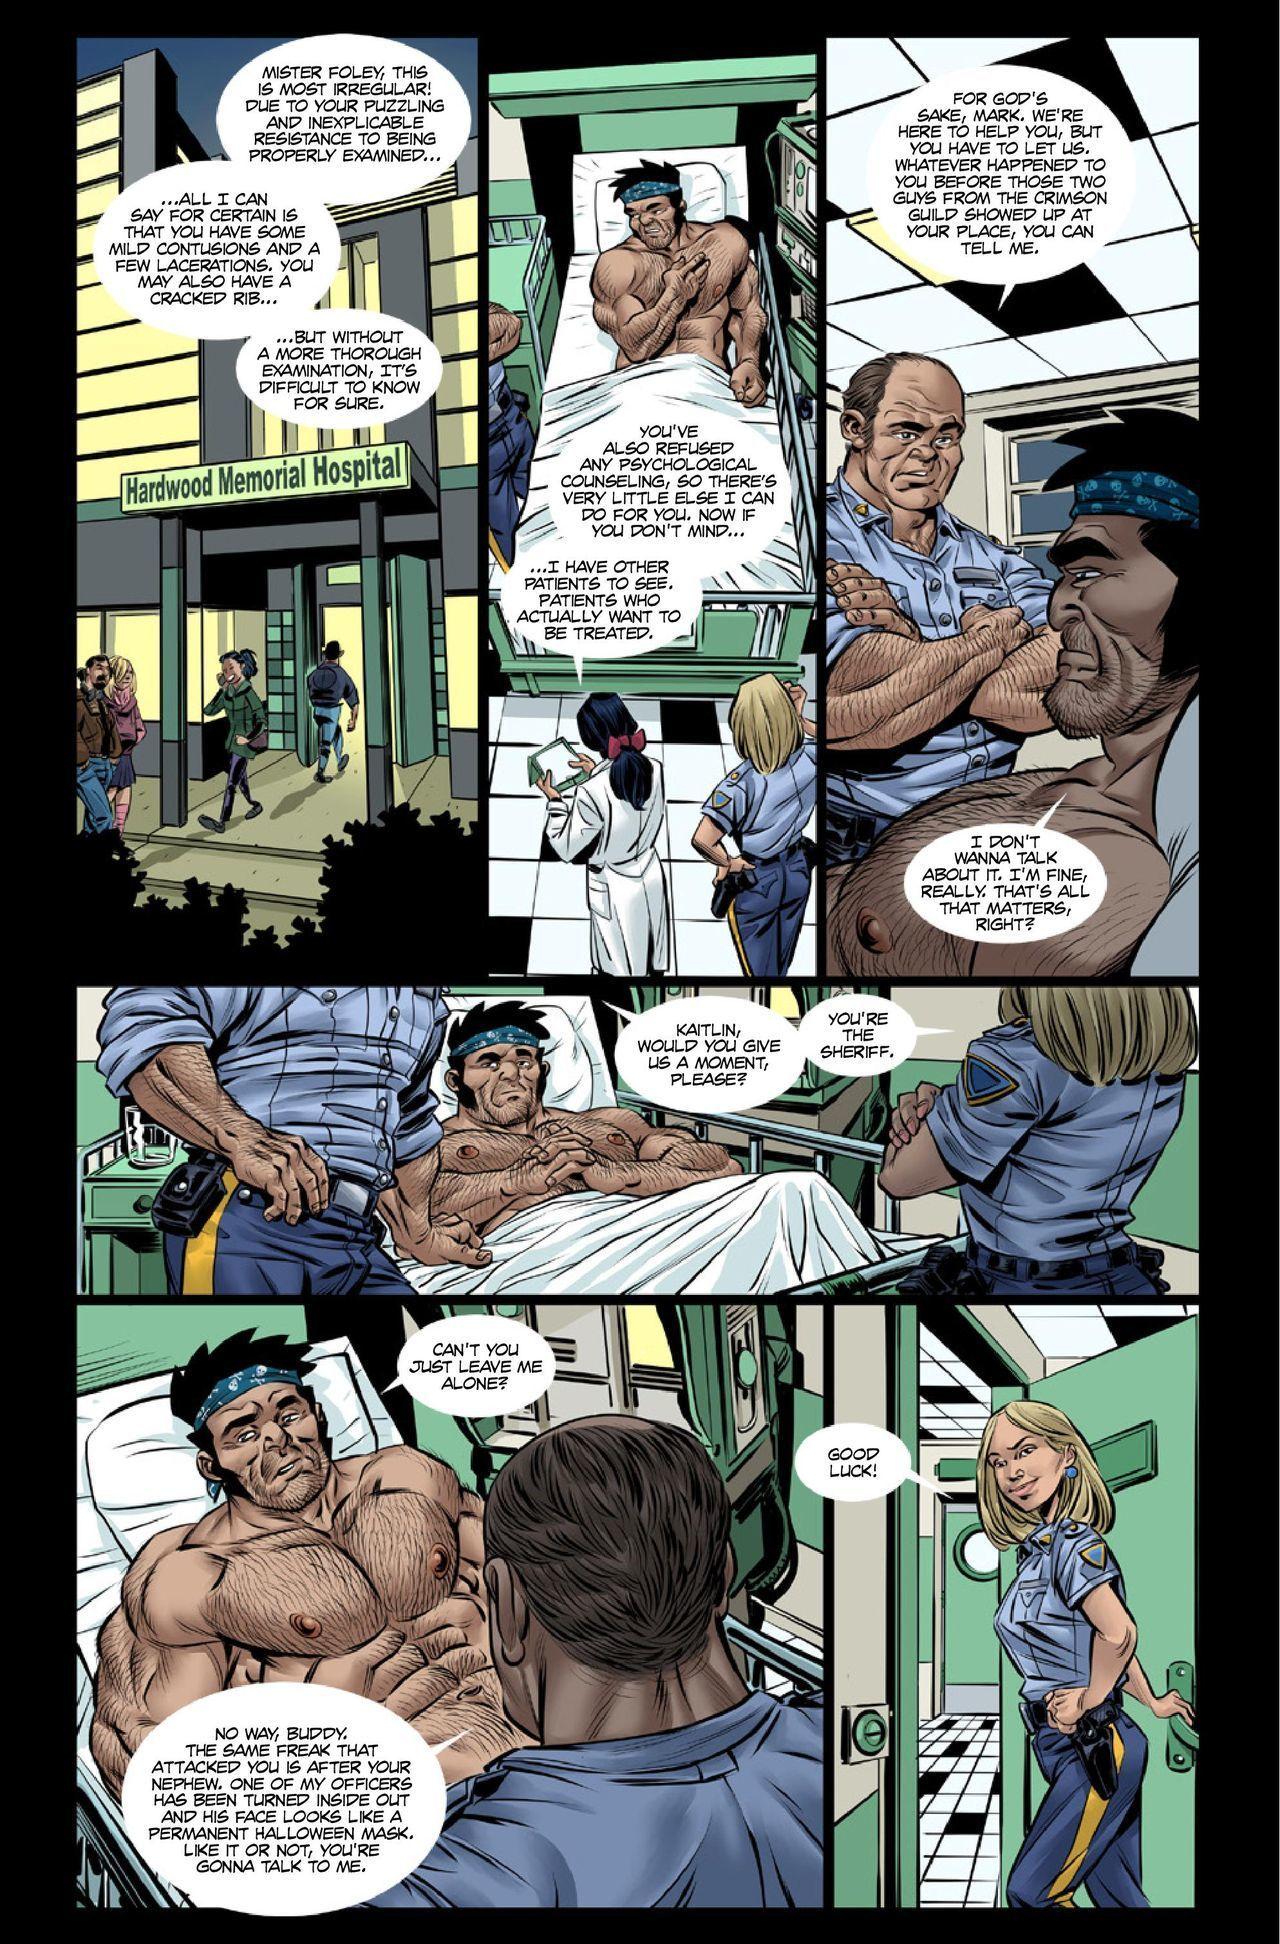 portugues Porky porn comic em gay brasil